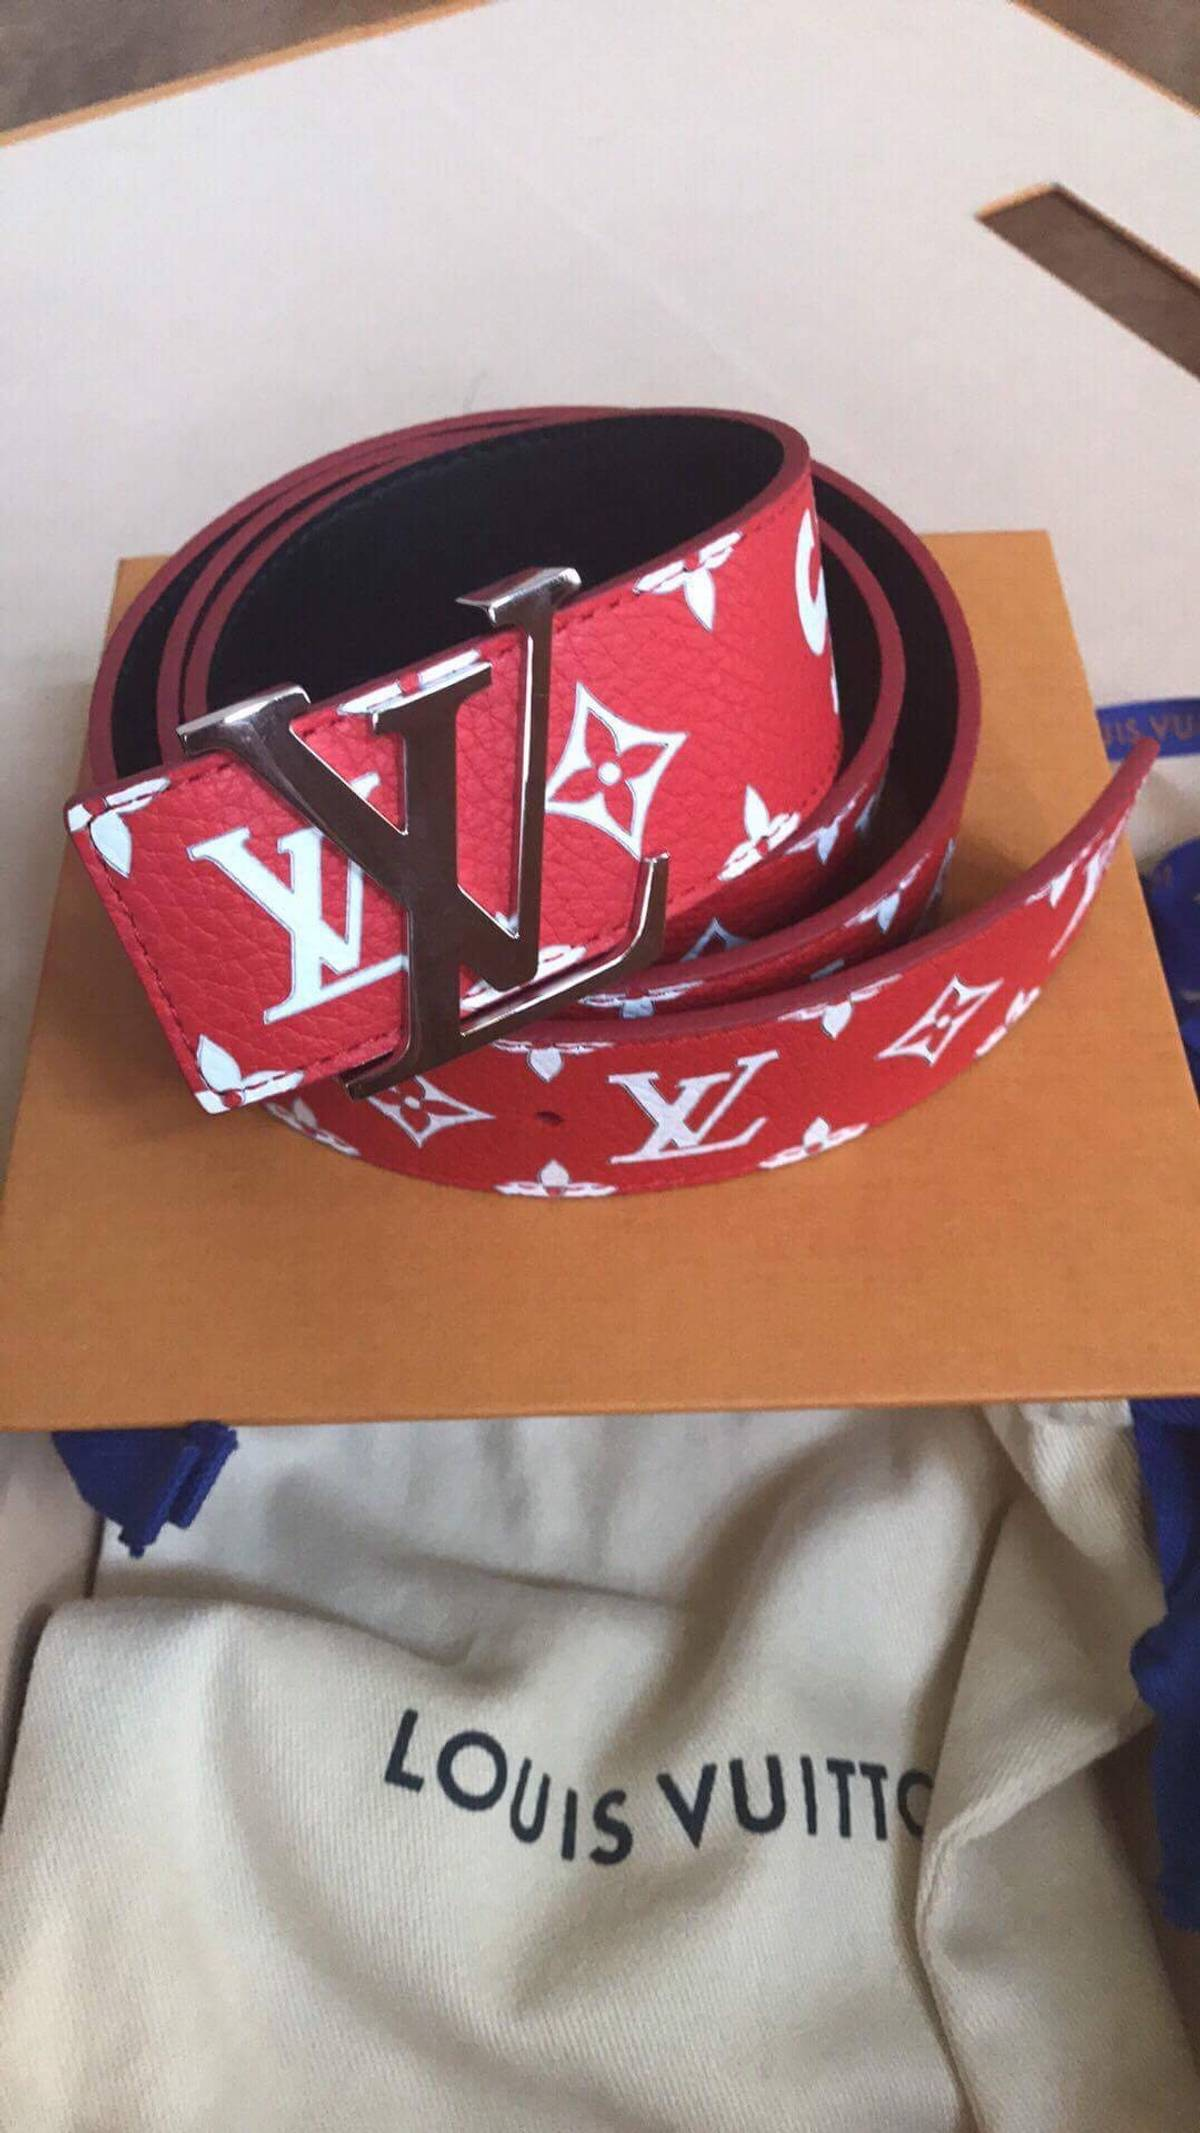 039022a9d6bf Supreme Supreme X Louis Vuitton Collab Belt Size 34 - Belts for Sale ...